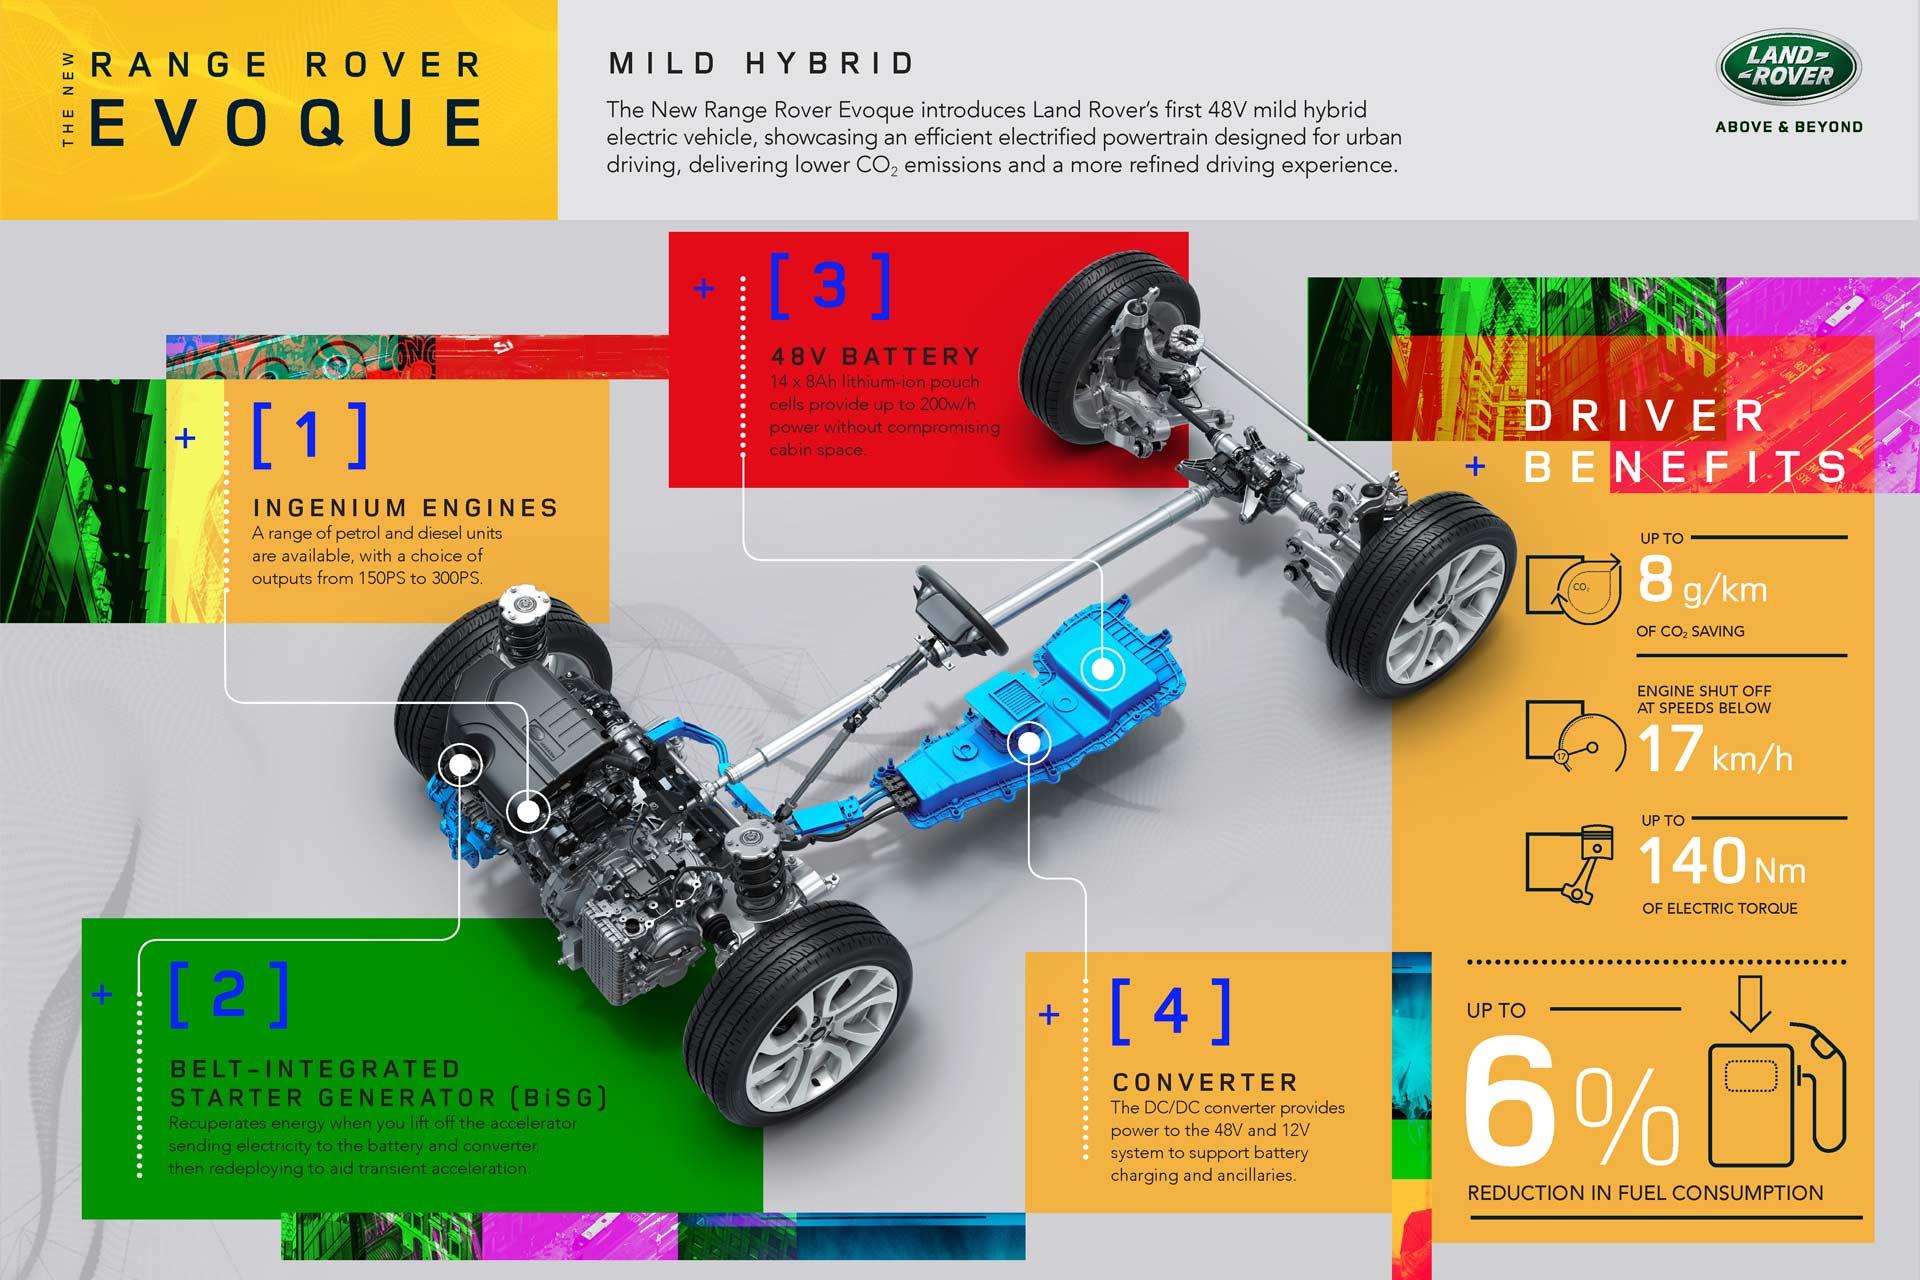 2020-Range-Rover-Evoque-Mild-Hybrid-Platform-Chassis